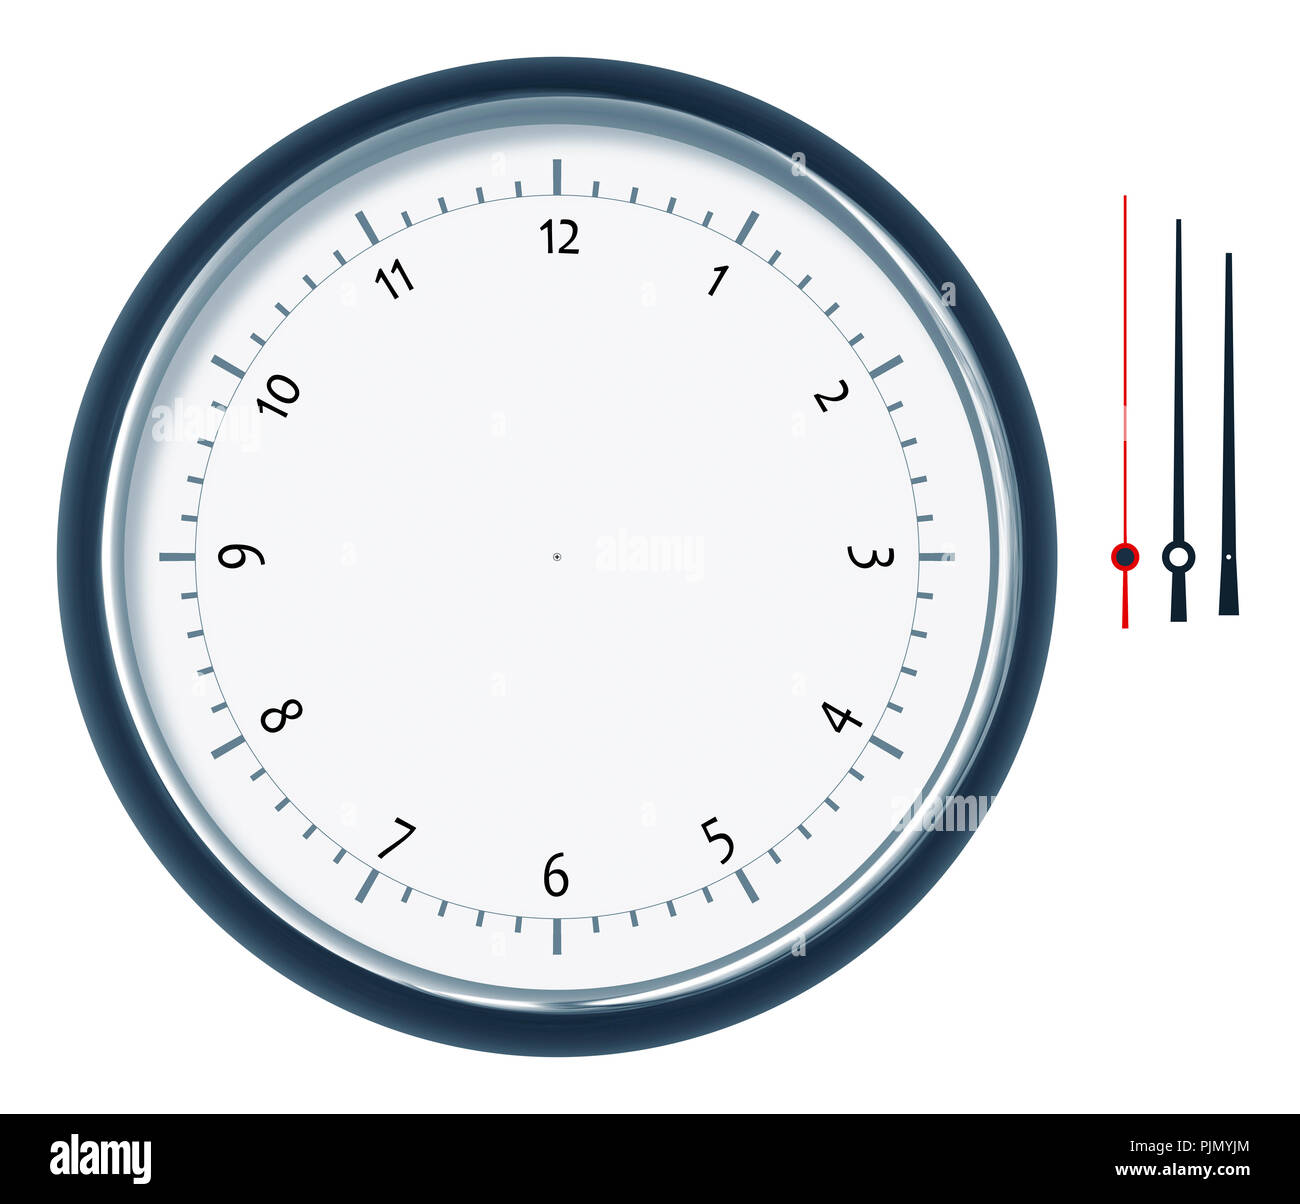 An image of a nice clock construction set - Stock Image